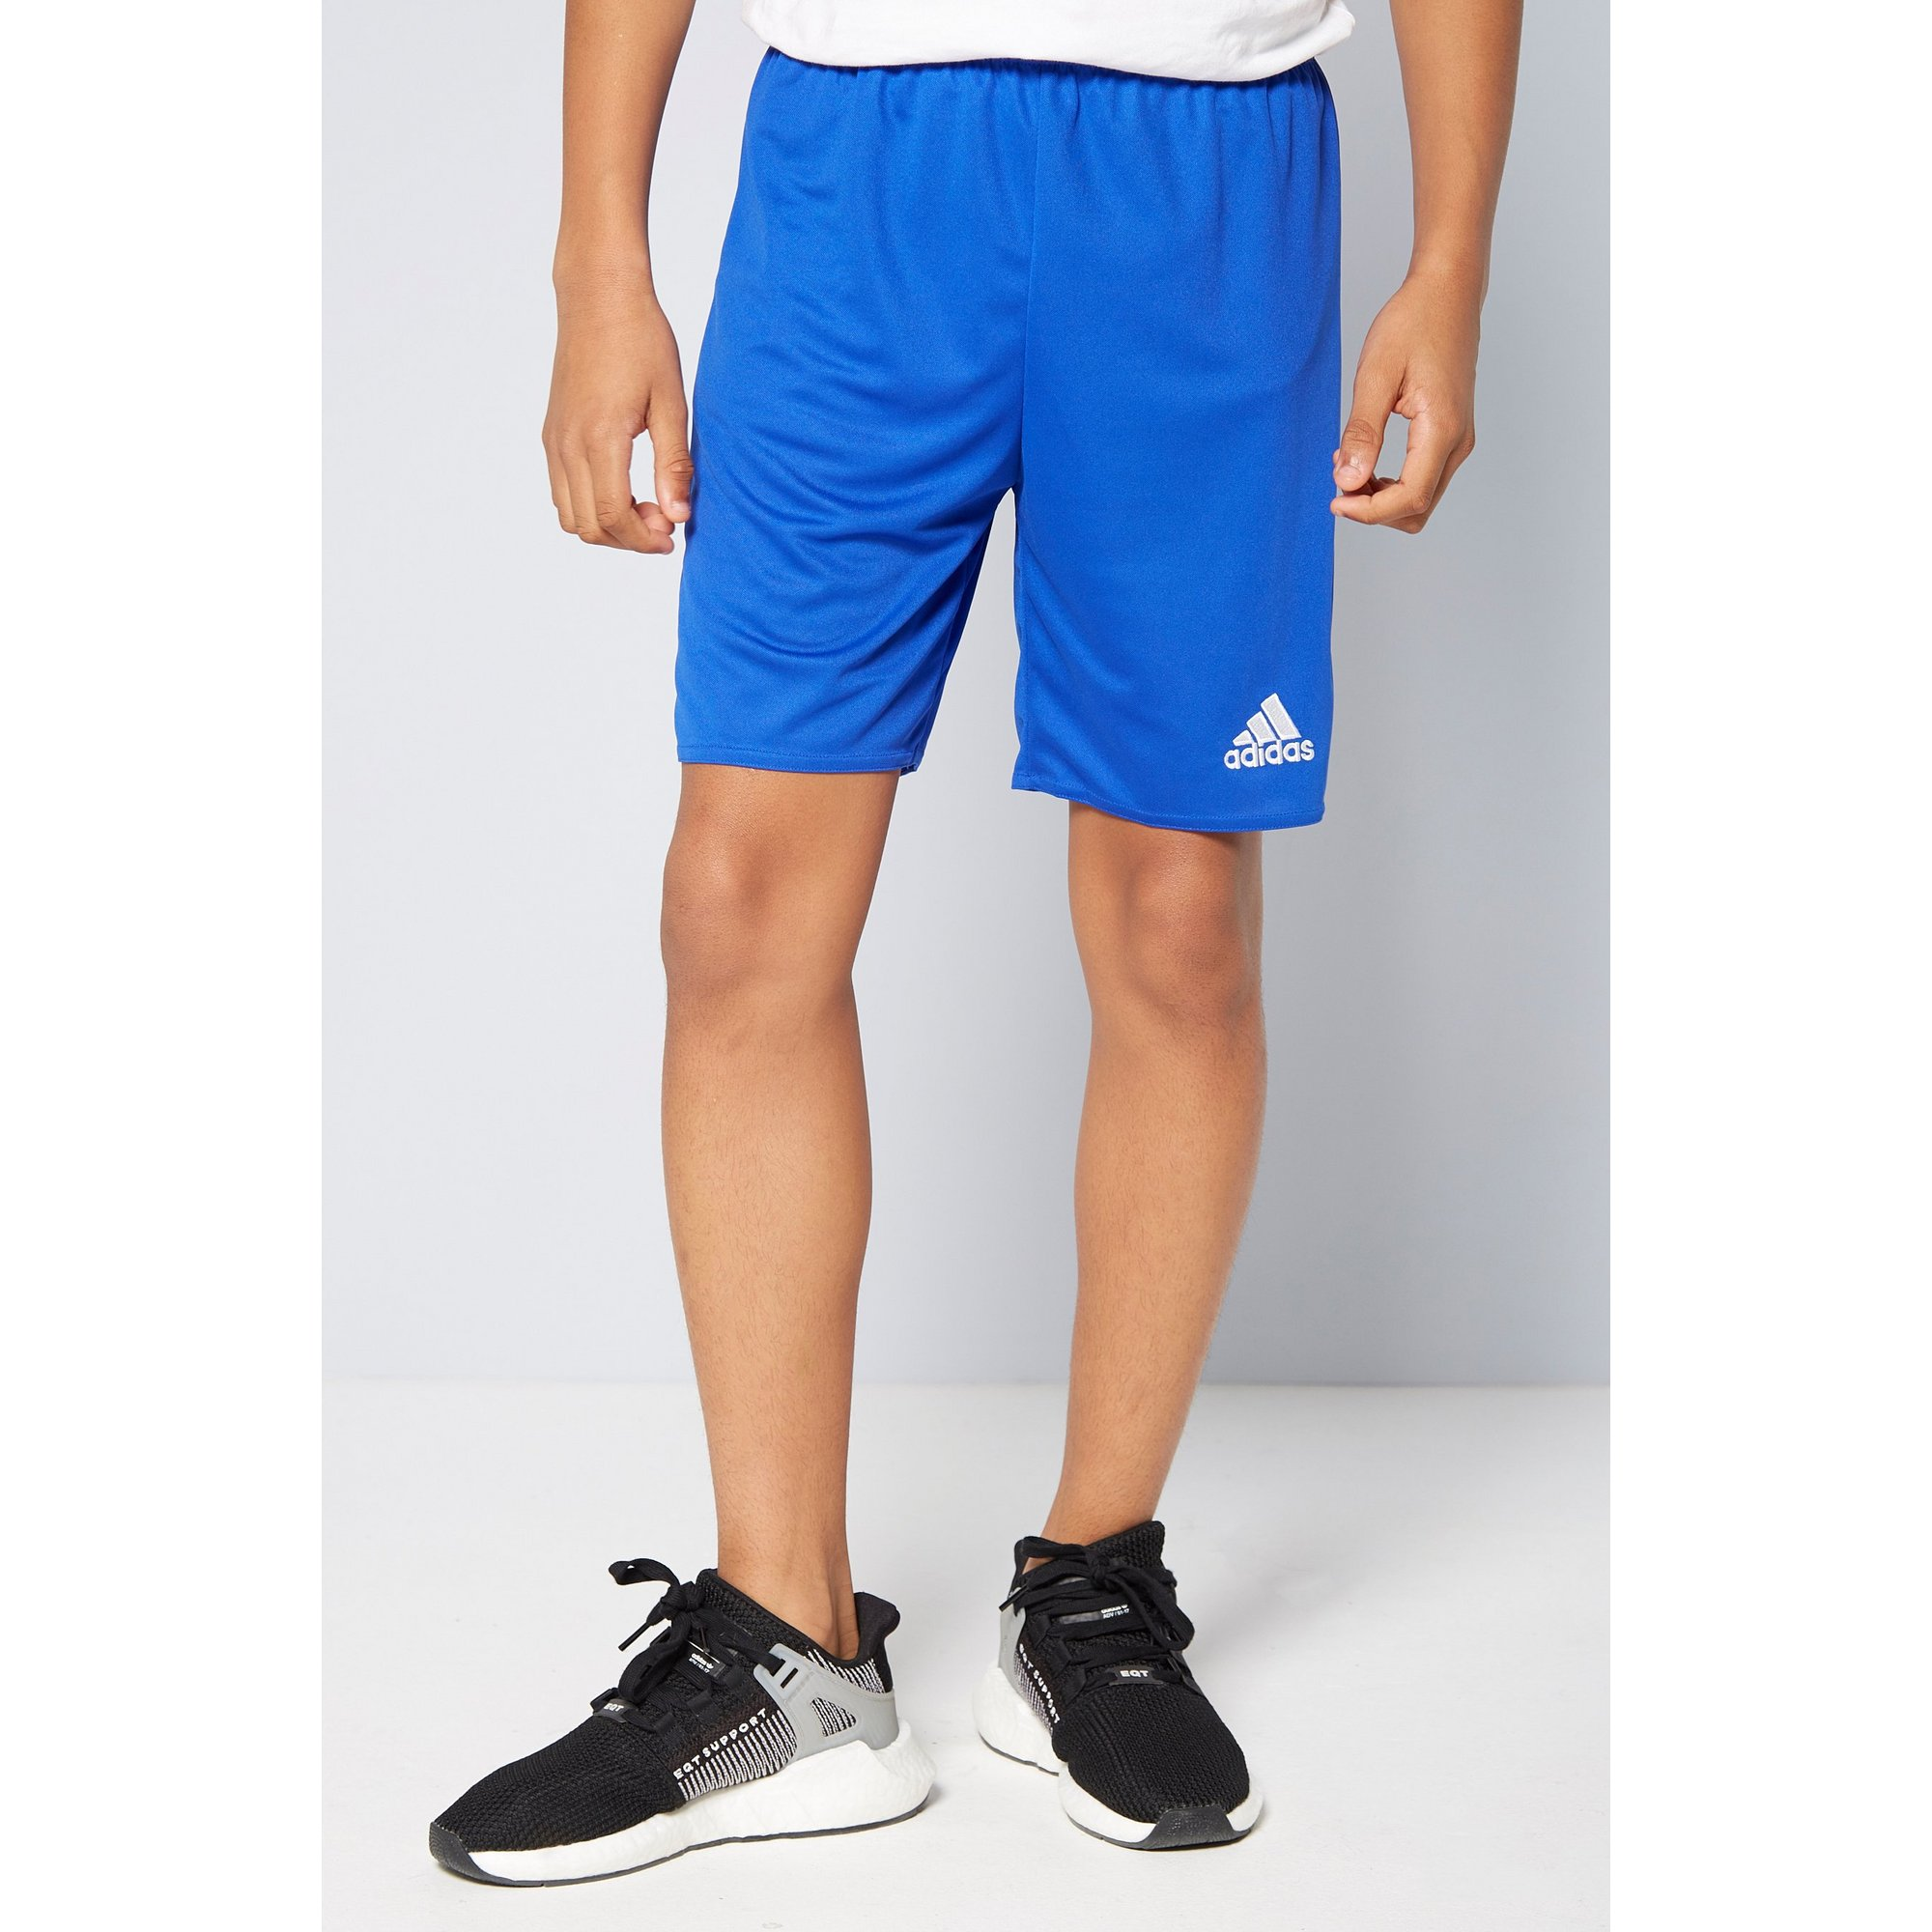 Image of Boys adidas Blue Parma Shorts